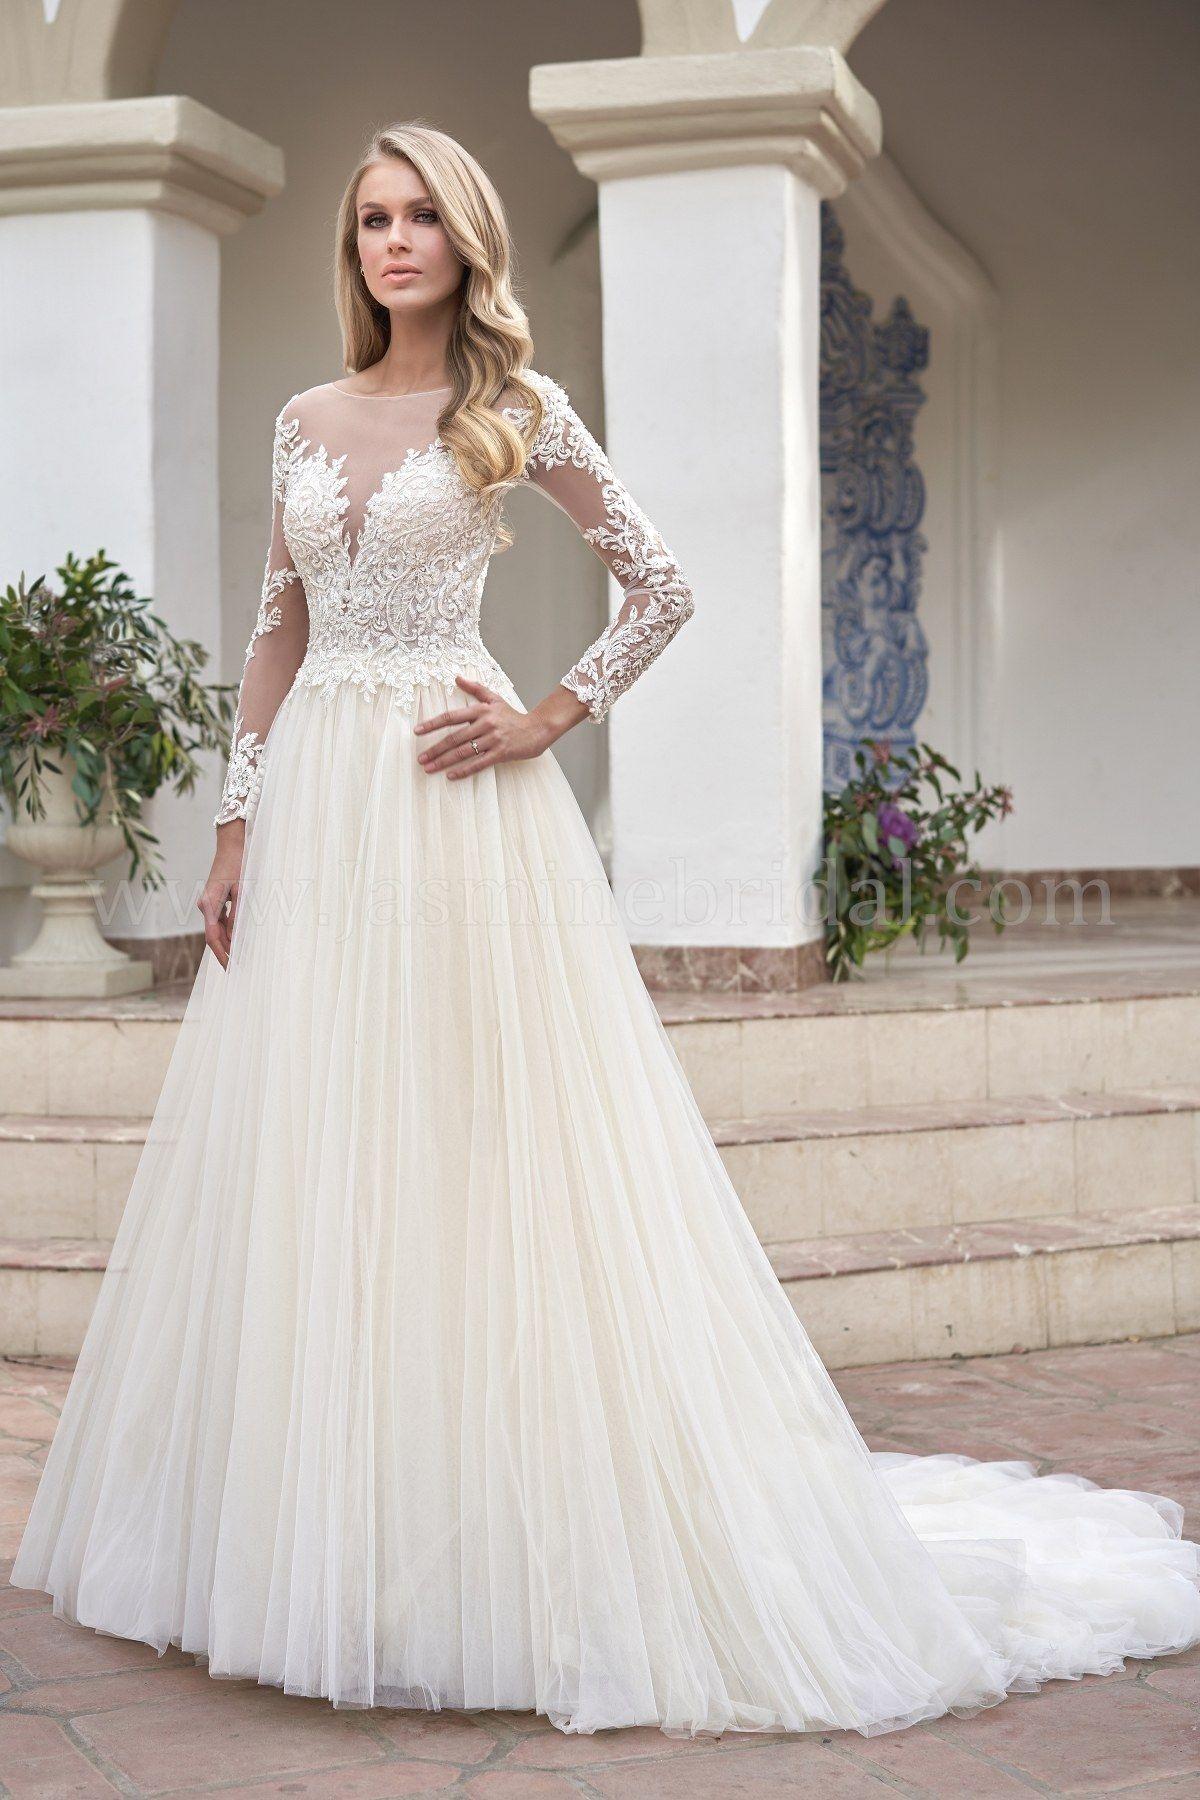 Long sleeve plus size wedding dress  Jasmine Bridal  Couture  Long Sleeve Wedding Dress  Illusion